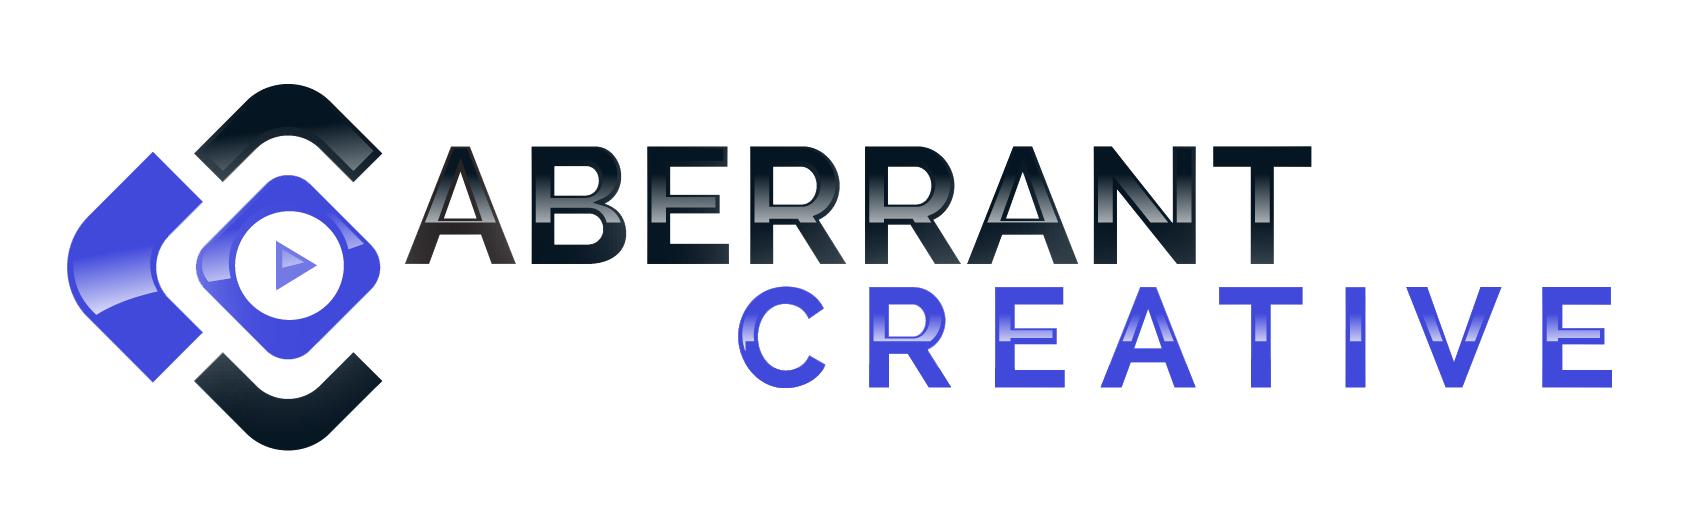 Aberrant Creative